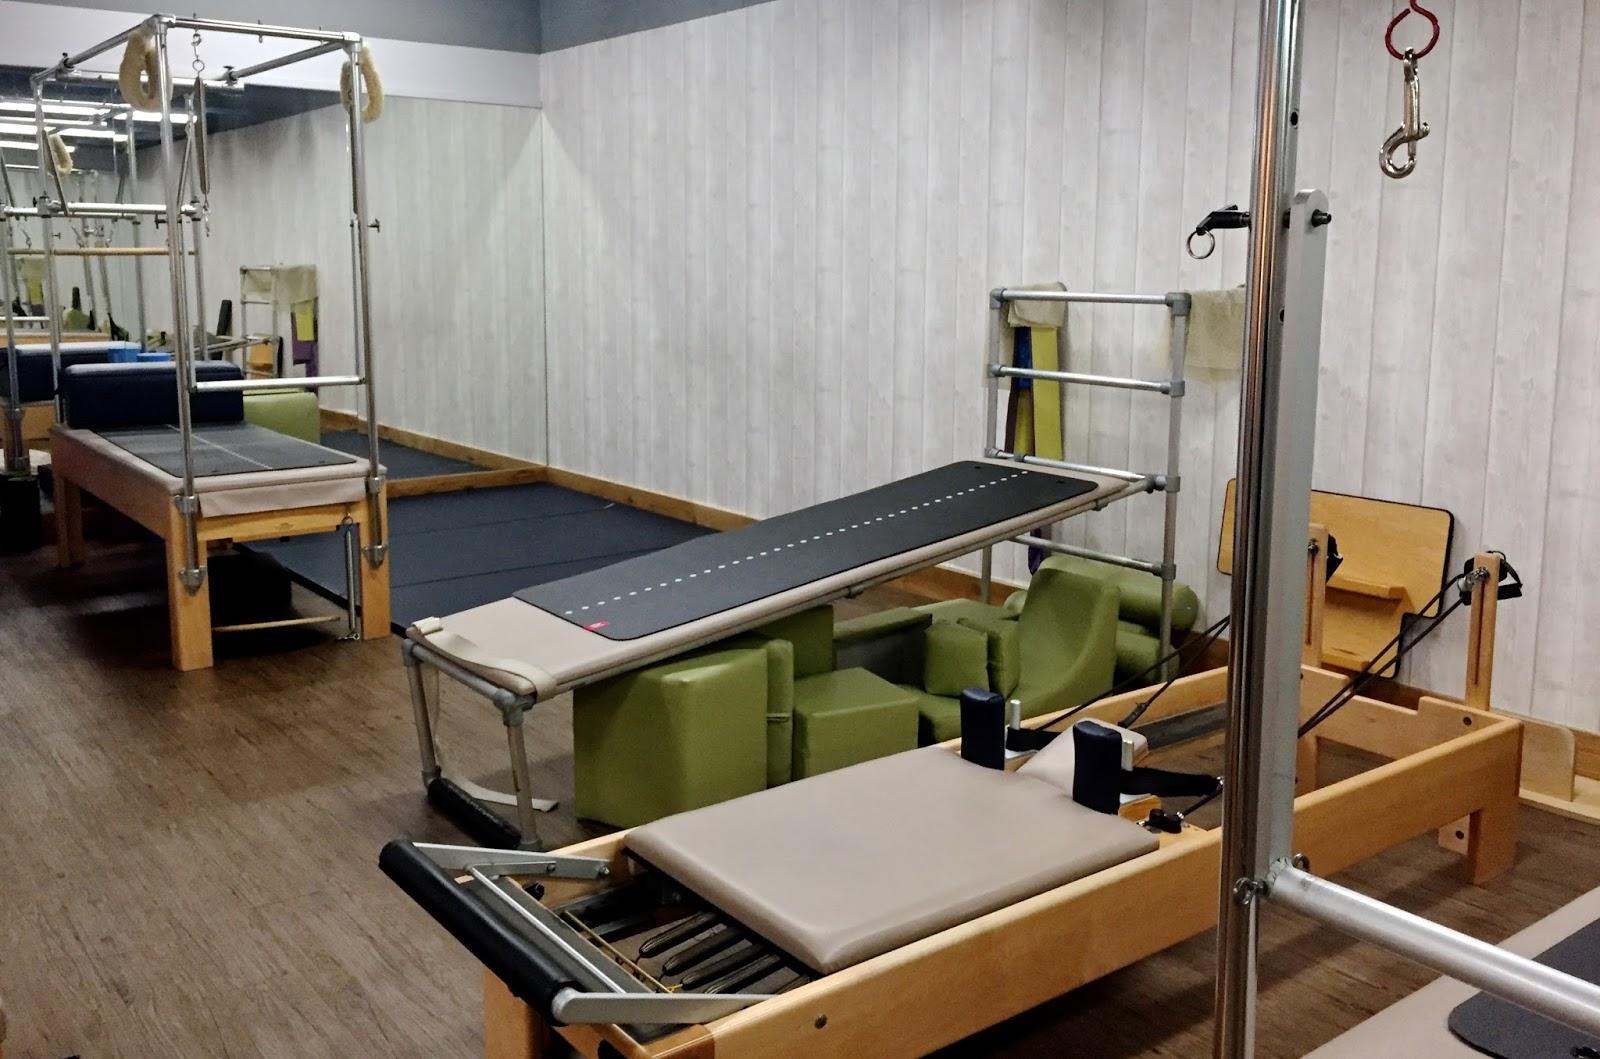 Harbour Club Chelsea Reformer Pilates Room